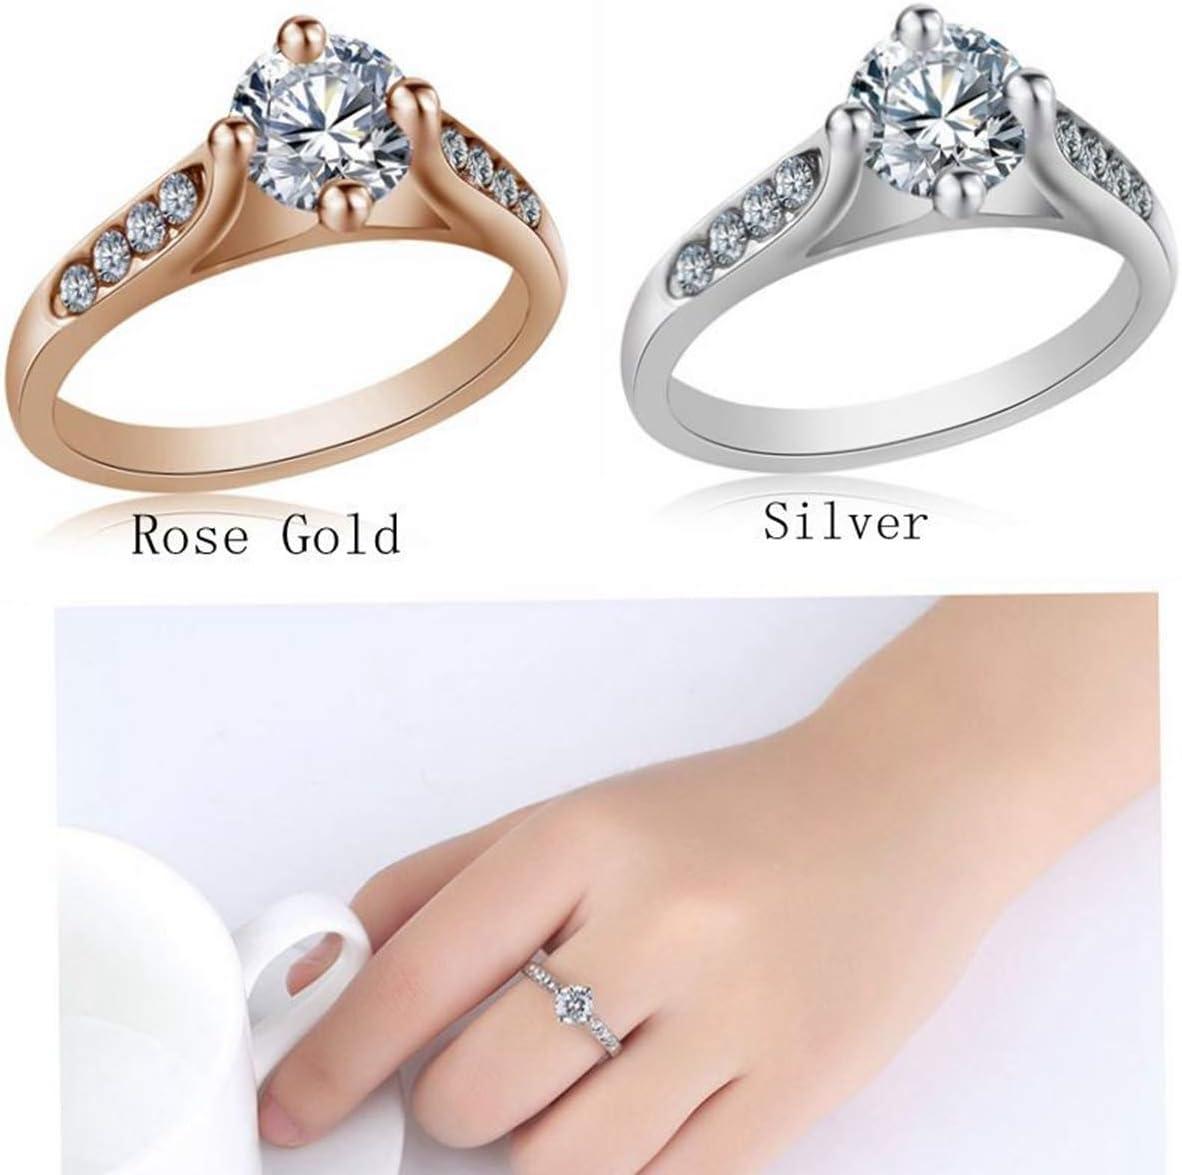 Haluoo/_Jewelry Diamond Ring,Haluoo Rose Gold Openwork Cubic Zirconia Rhinestones Circle Ring Luxury Large Diamond Promise Ring Wedding Engagement Ring Anniversary Ring for Women Girls